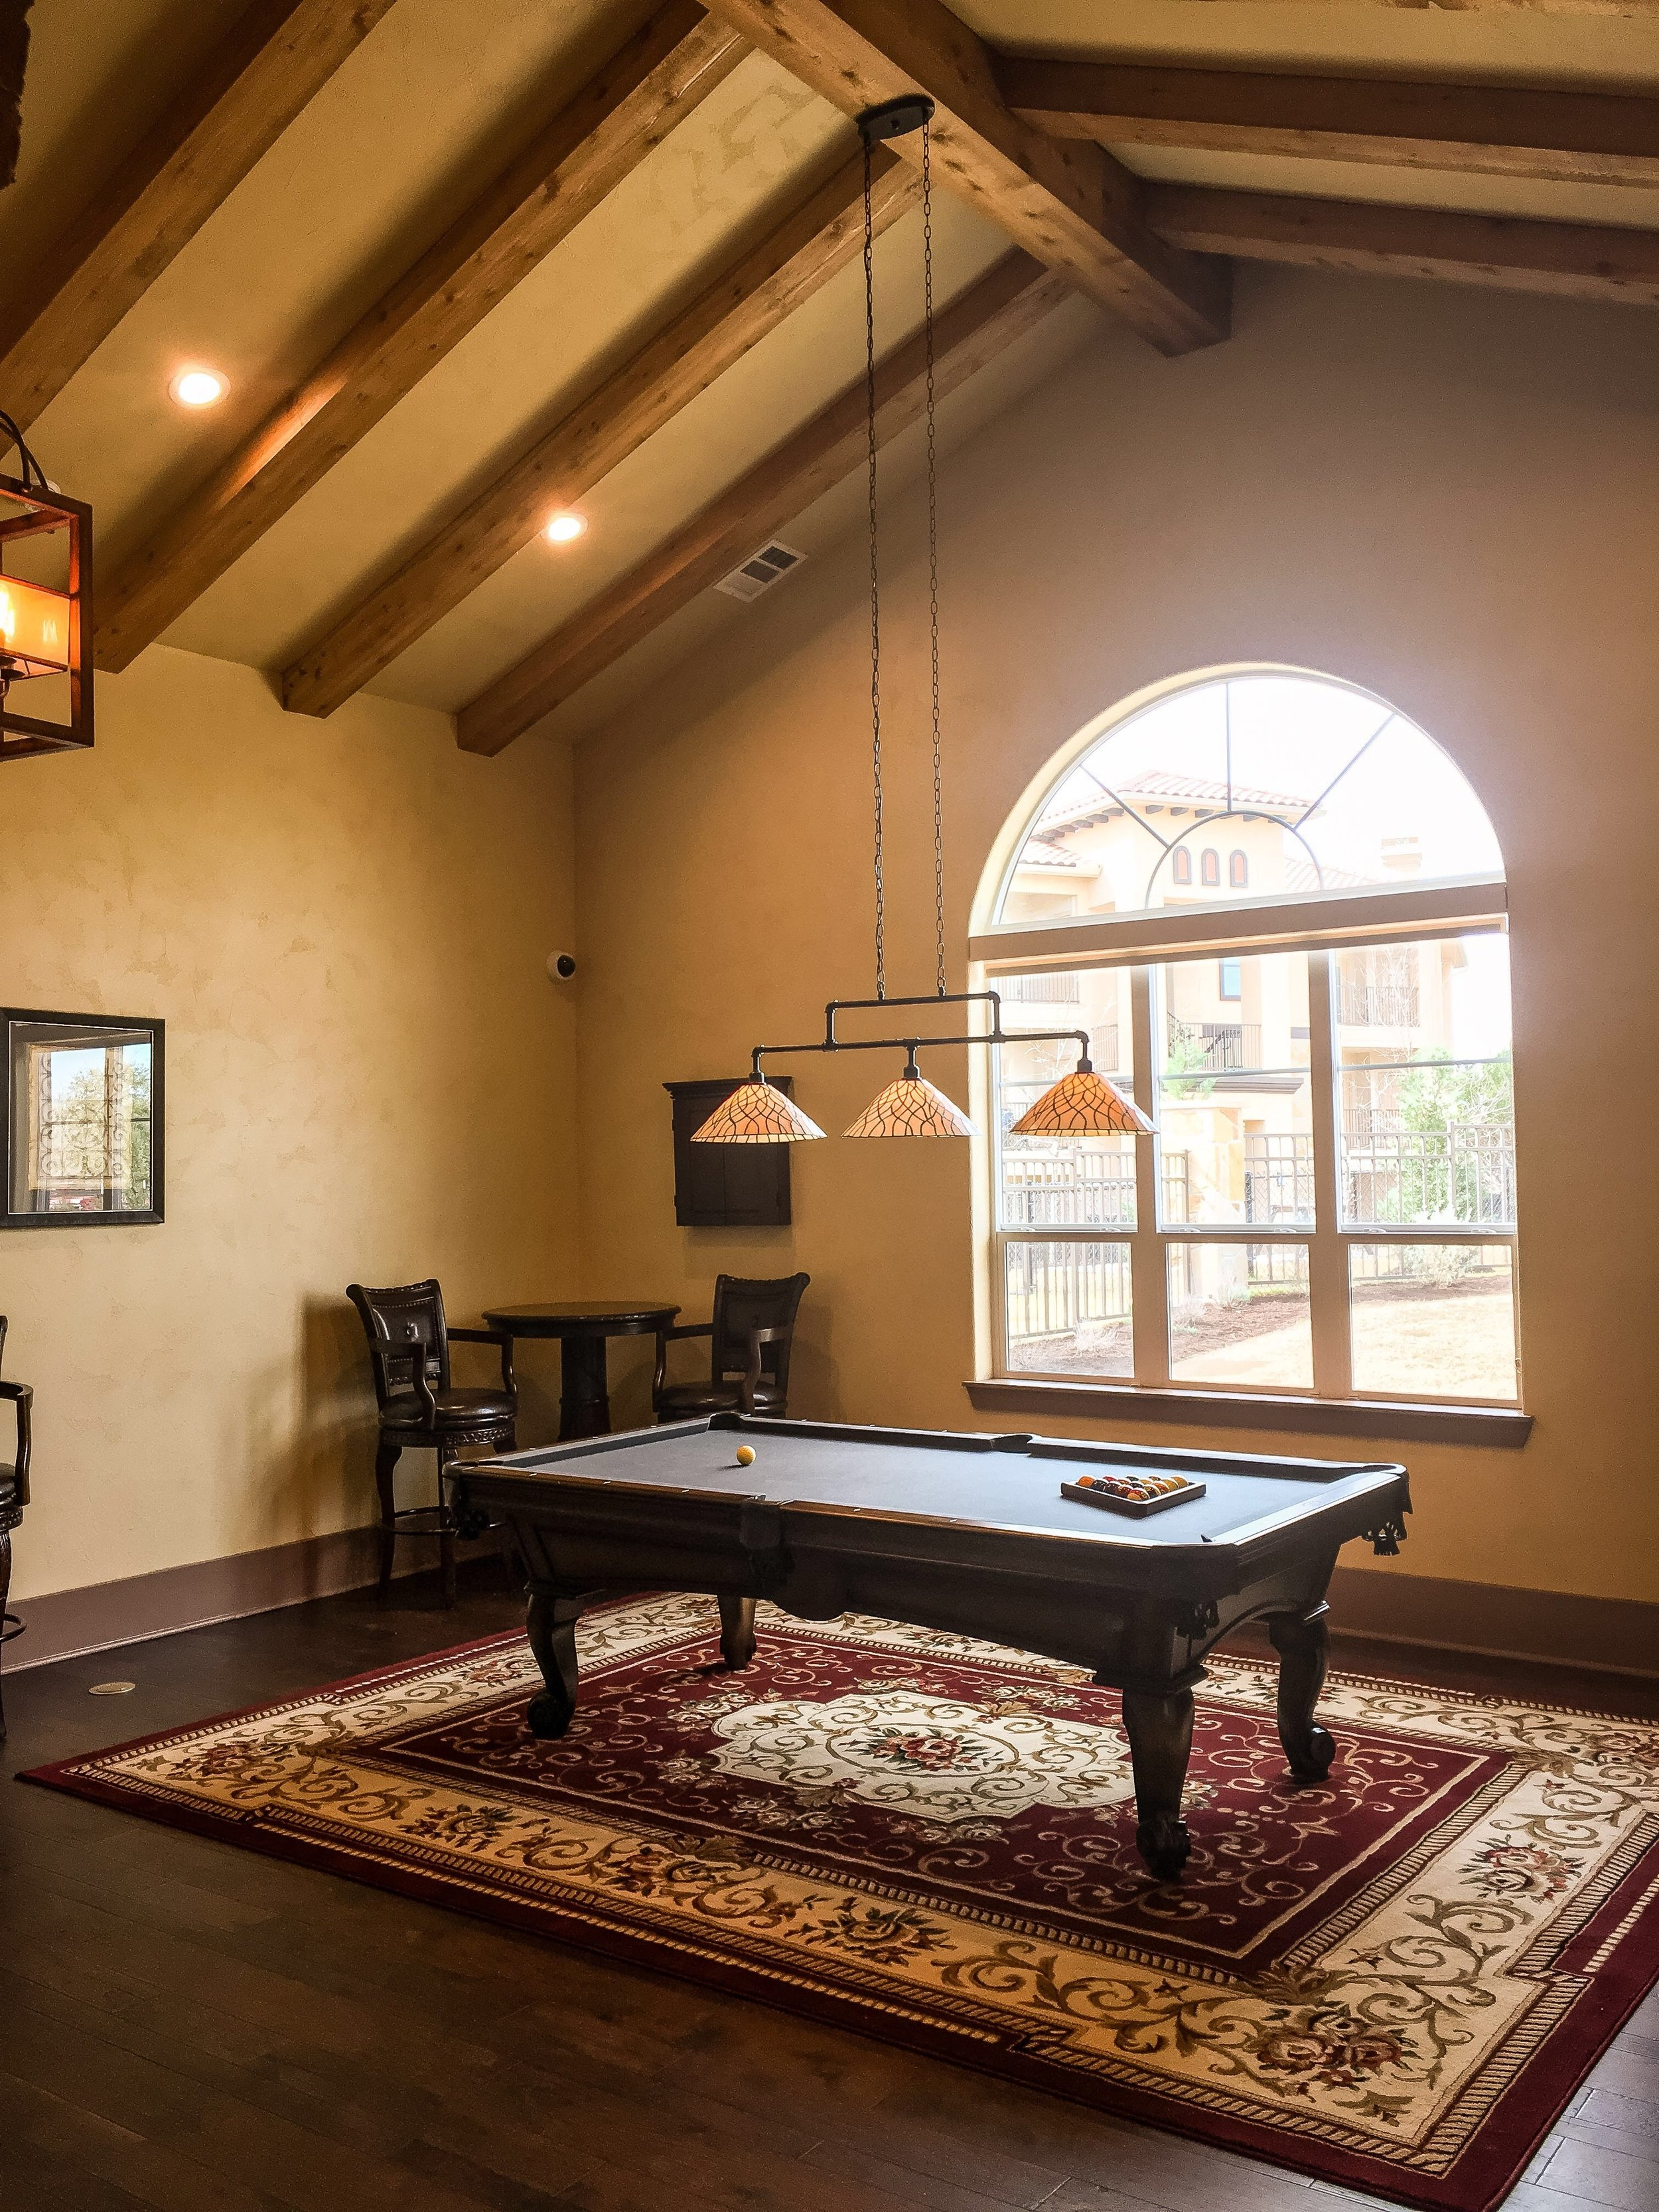 Creekside at Parmer Lane - Austin, Texas (Leasing Office Billiards Room)